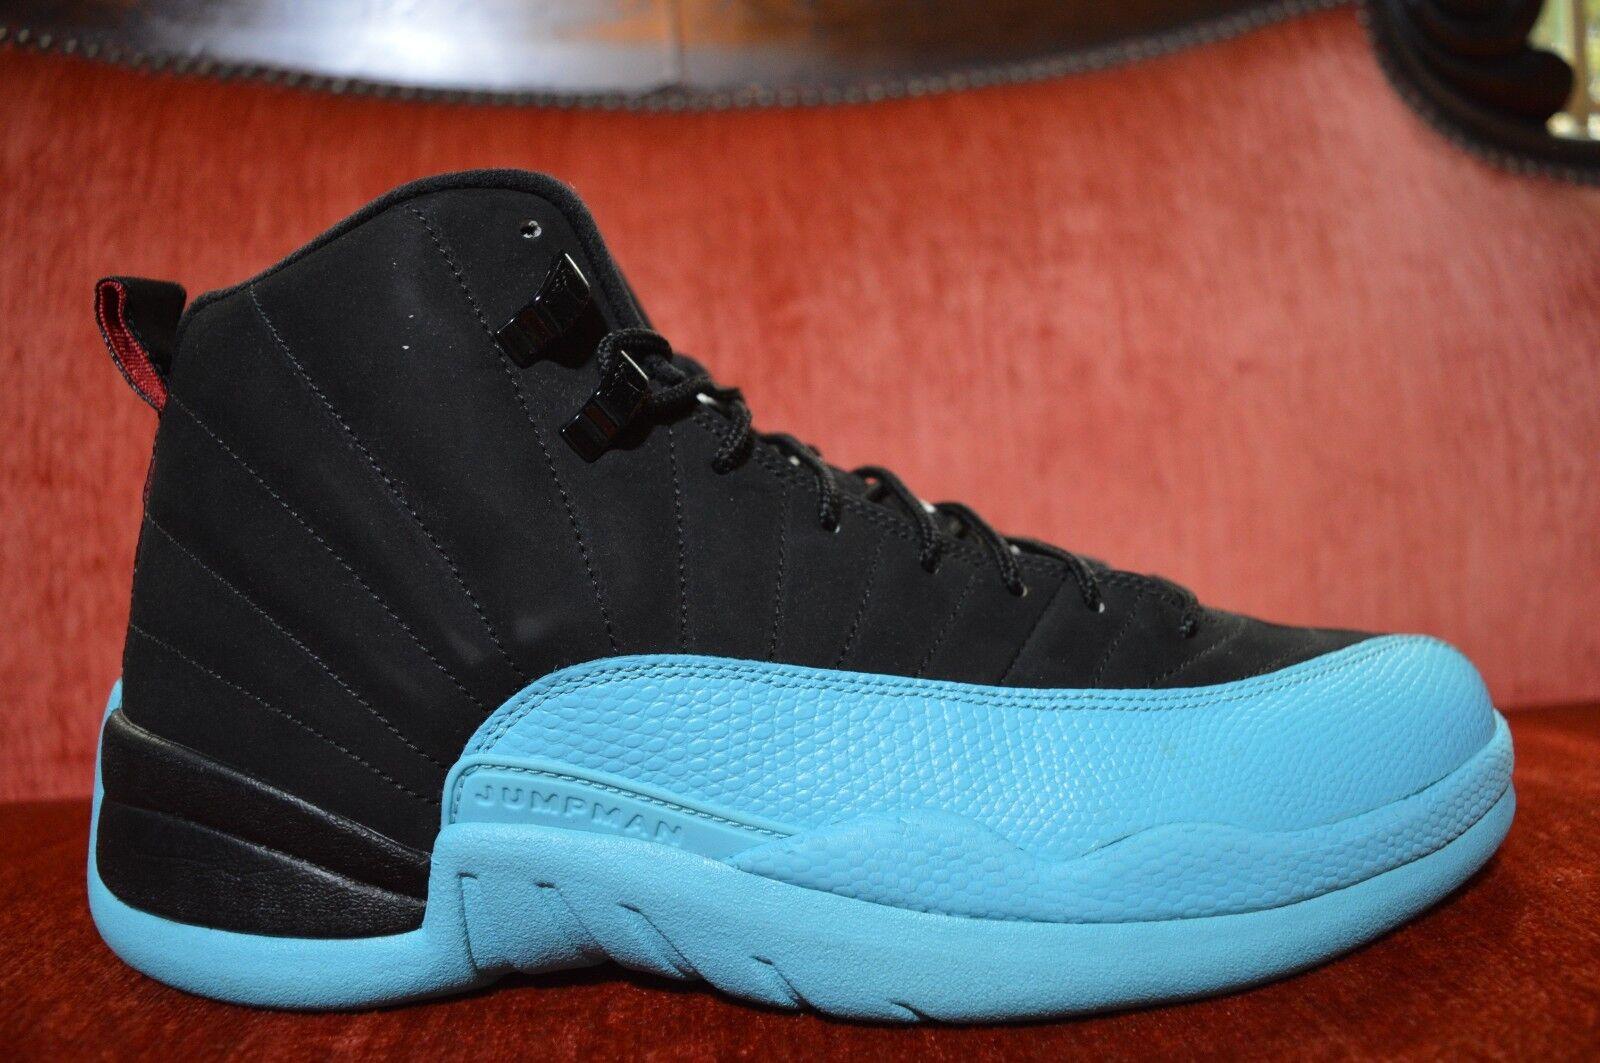 e2088475ea6 WORN 1X Nike Air Jordan XII 12 Retro bluee 130690-027 Size 10.5 Black Gamma  Black nxtjxy319-Athletic Shoes